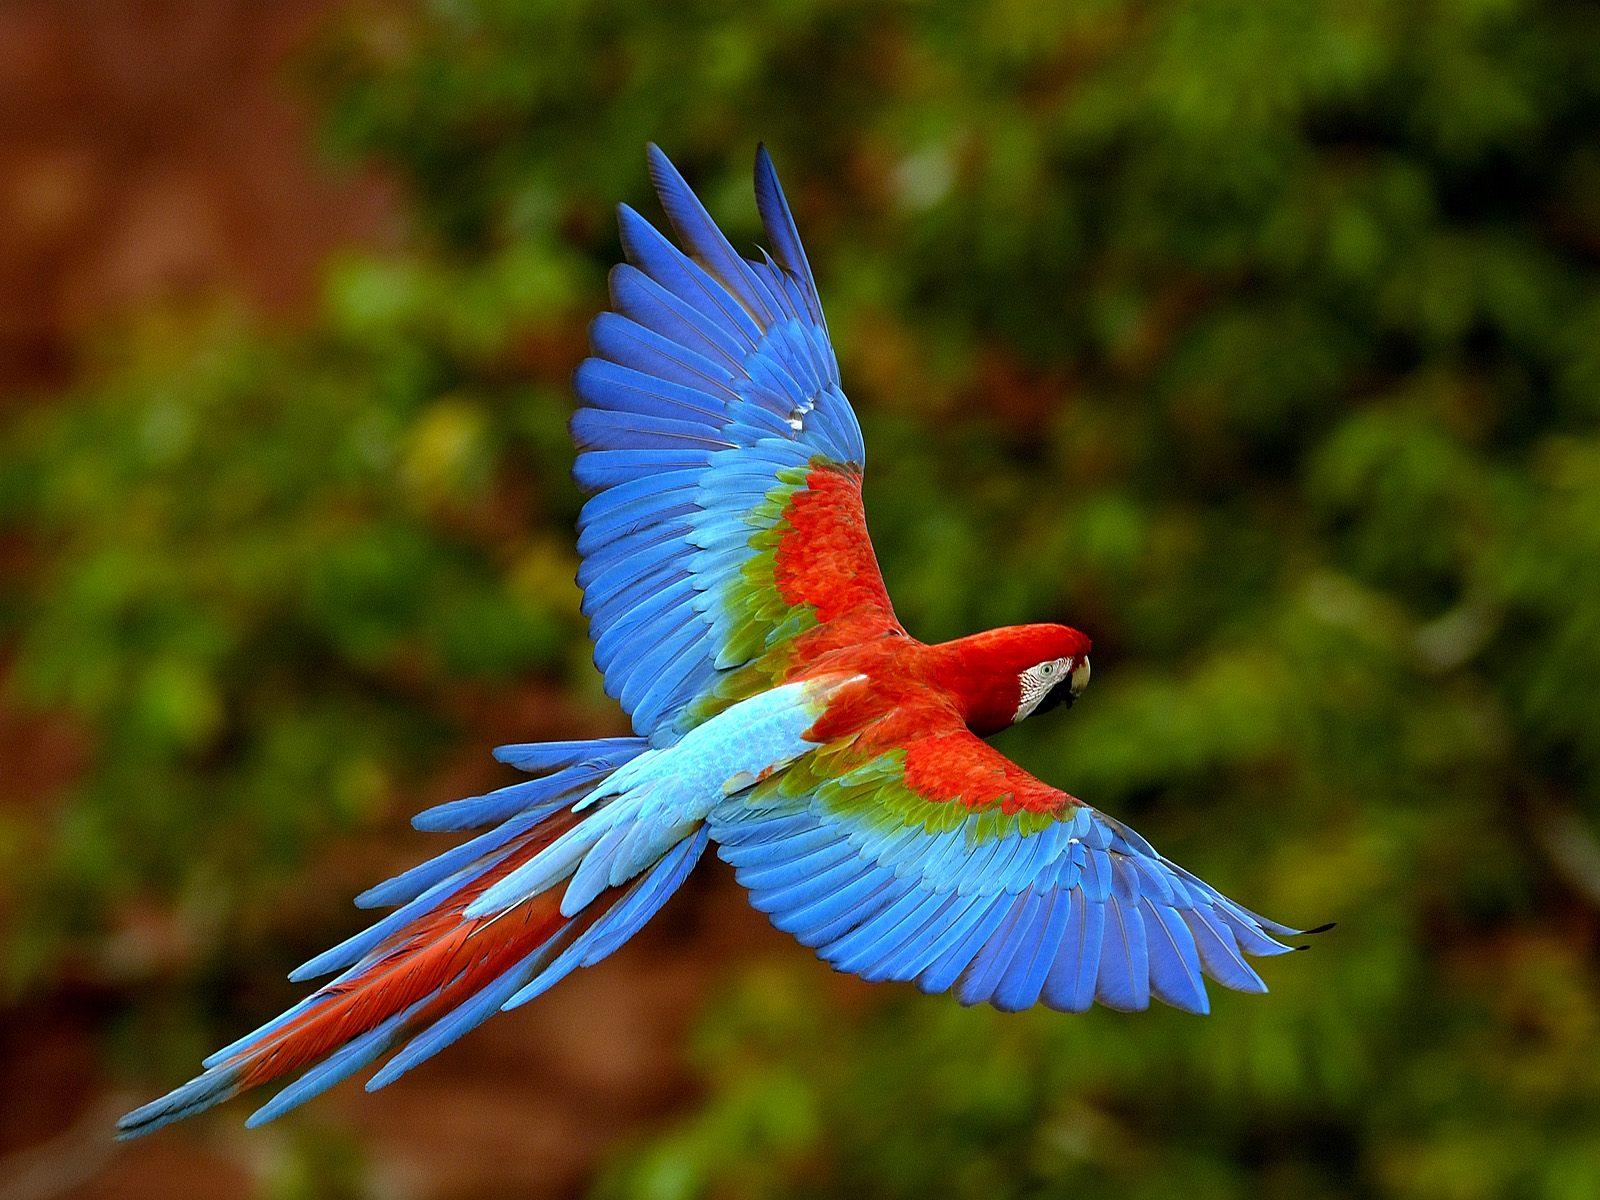 https://3.bp.blogspot.com/_2IU2Nt4rD1k/S68zLenIErI/AAAAAAAABOA/MjvFHMGLFW0/s1600/parrot.jpg